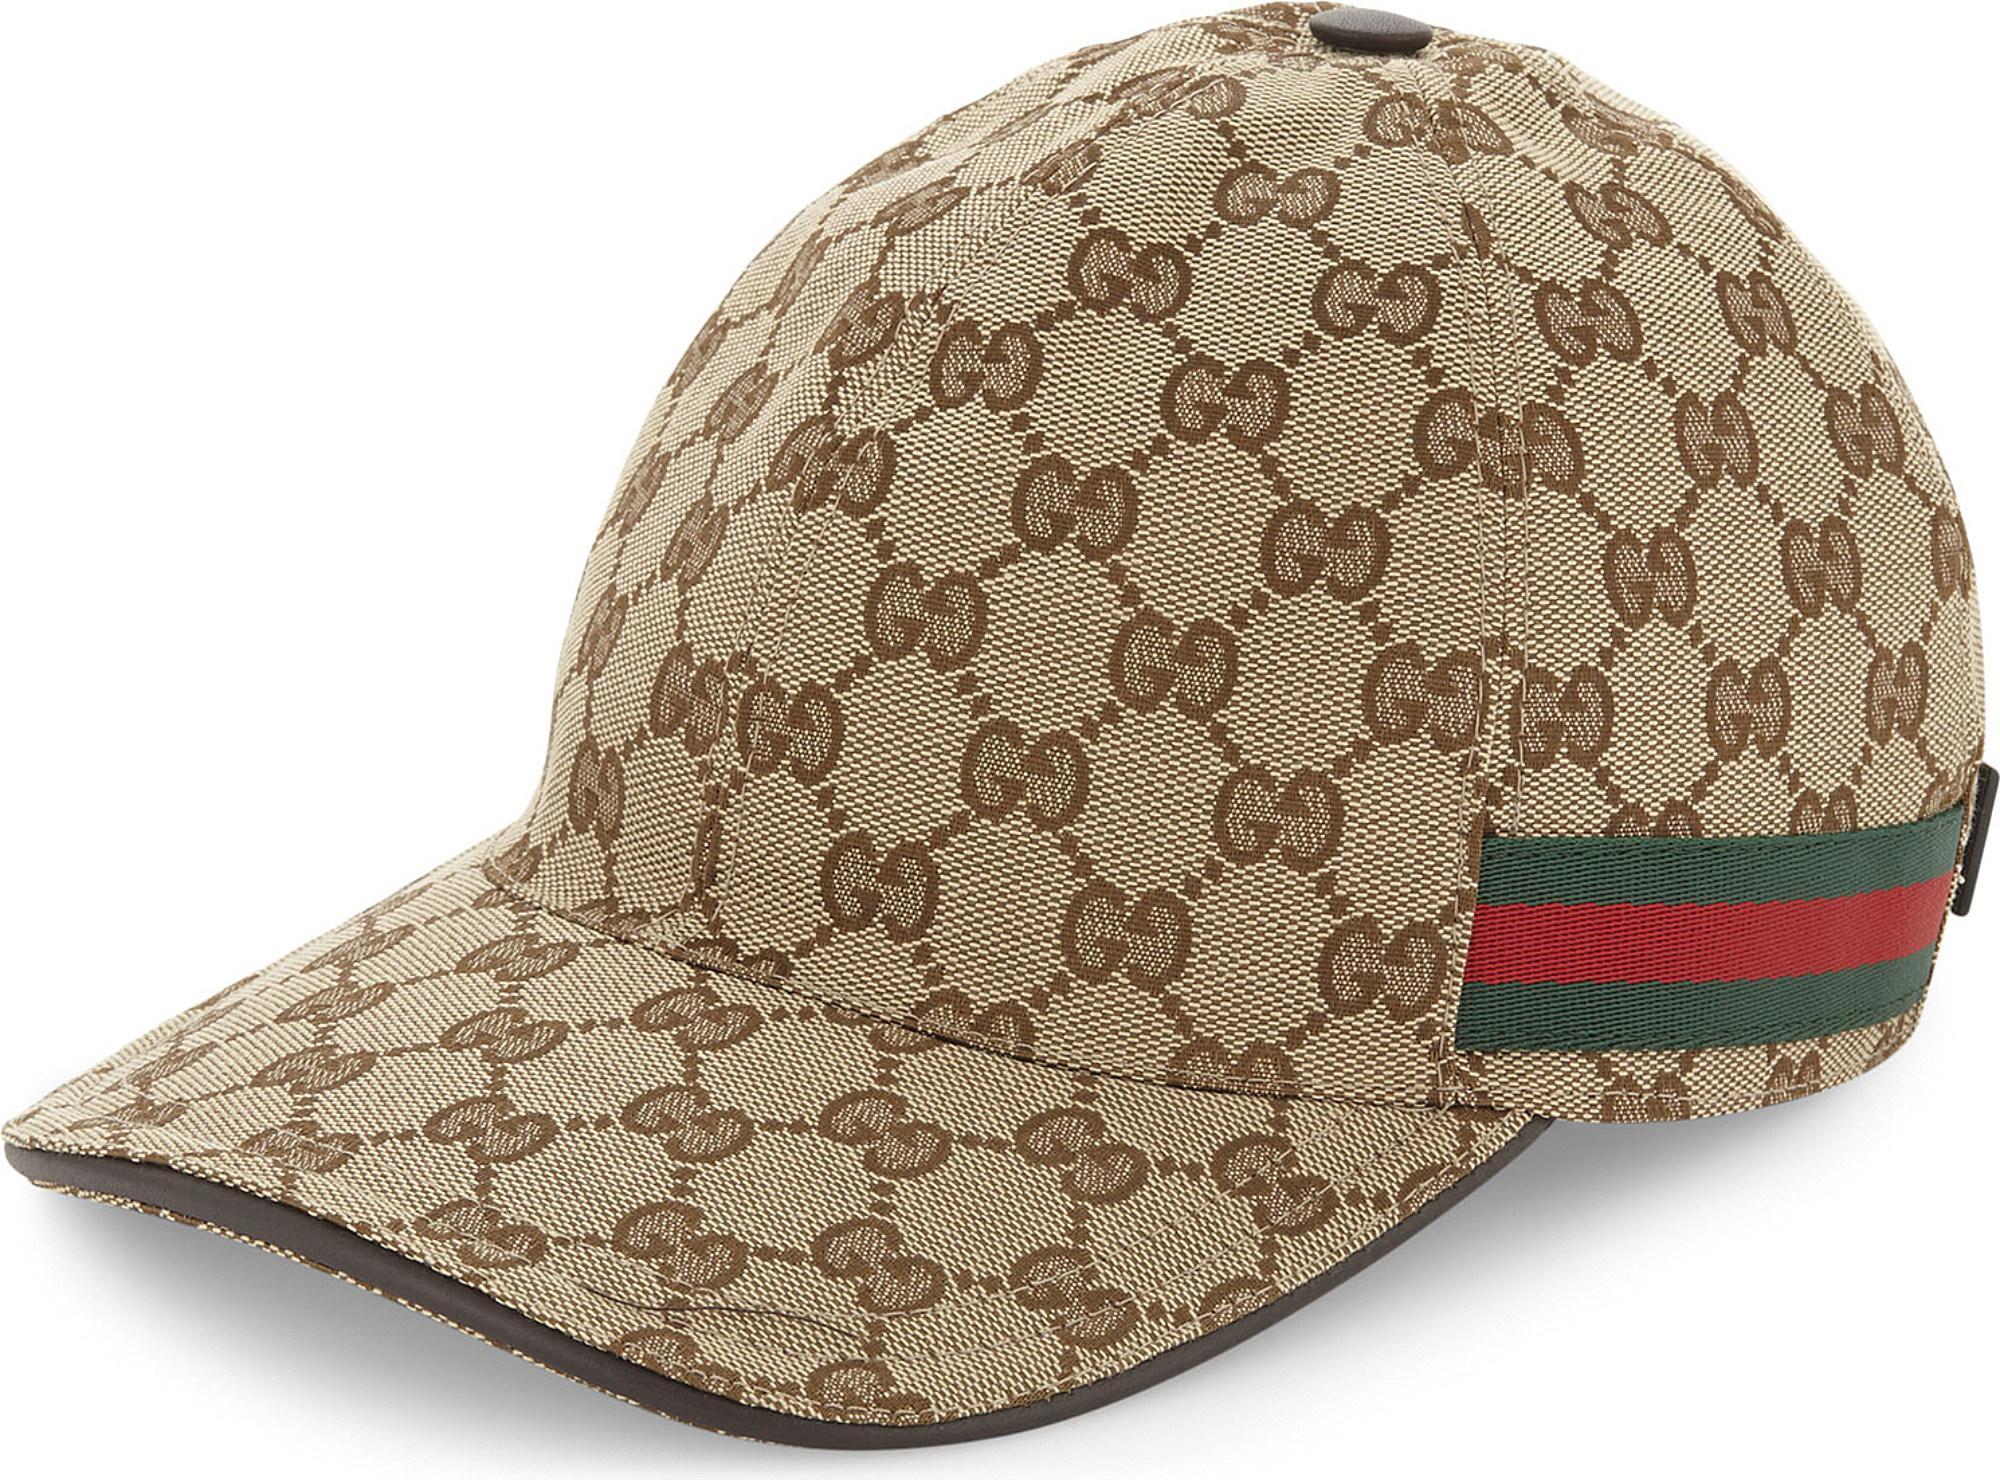 d7cdf8ff6e9 Gucci GG Web Stripe Baseball Cap in Brown for Men - Save 51% - Lyst